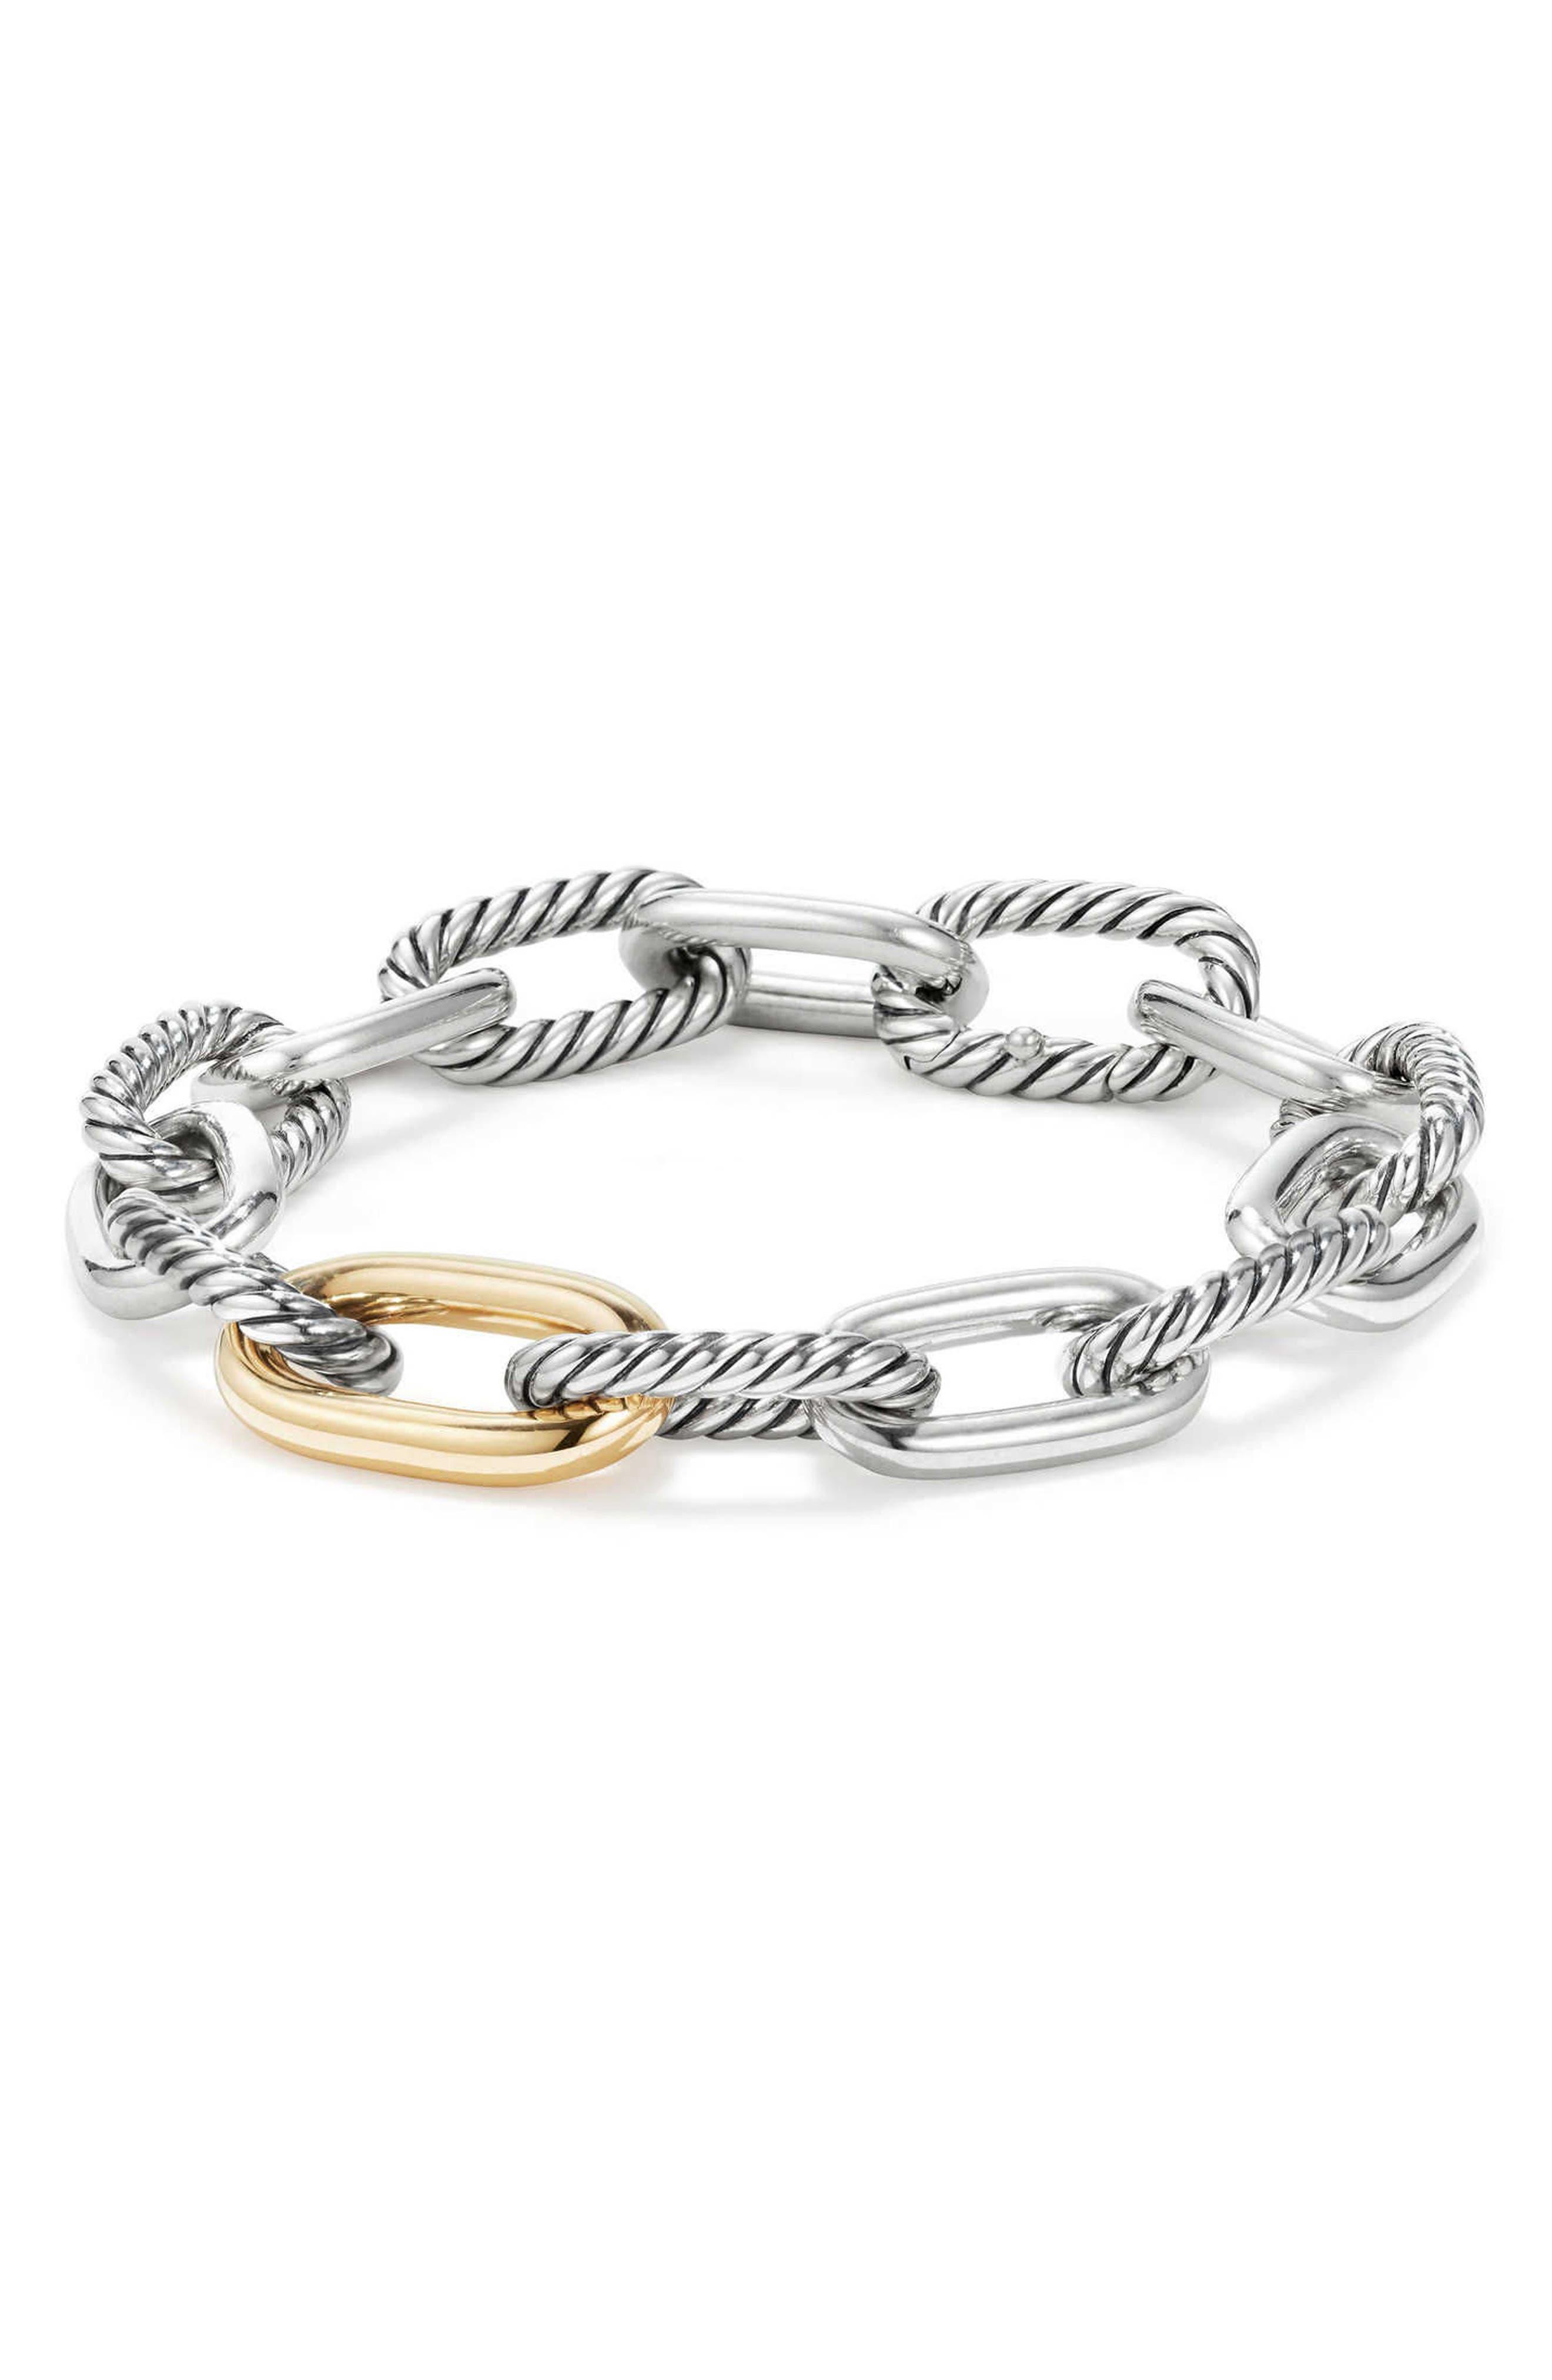 DY Madison Chain Medium Bracelet,                             Main thumbnail 1, color,                             GOLD/ SILVER